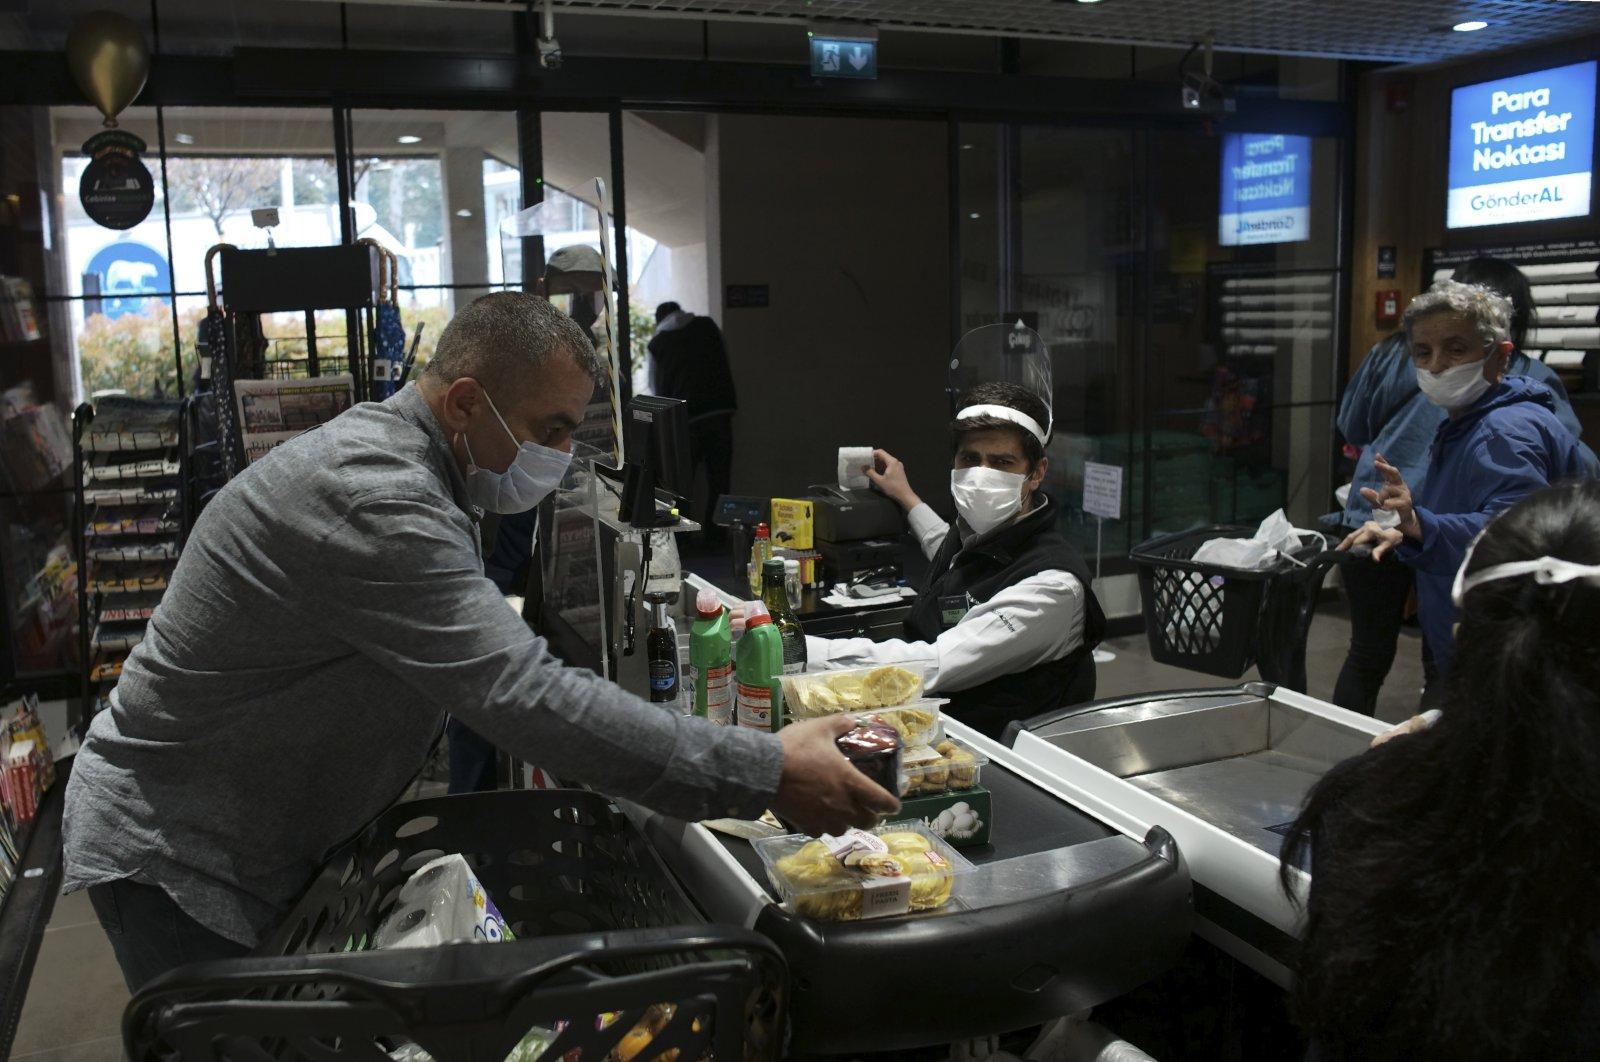 People wearing face masks shop for food at a market in Ankara, Turkey, April 21, 2020. (AP Photo)